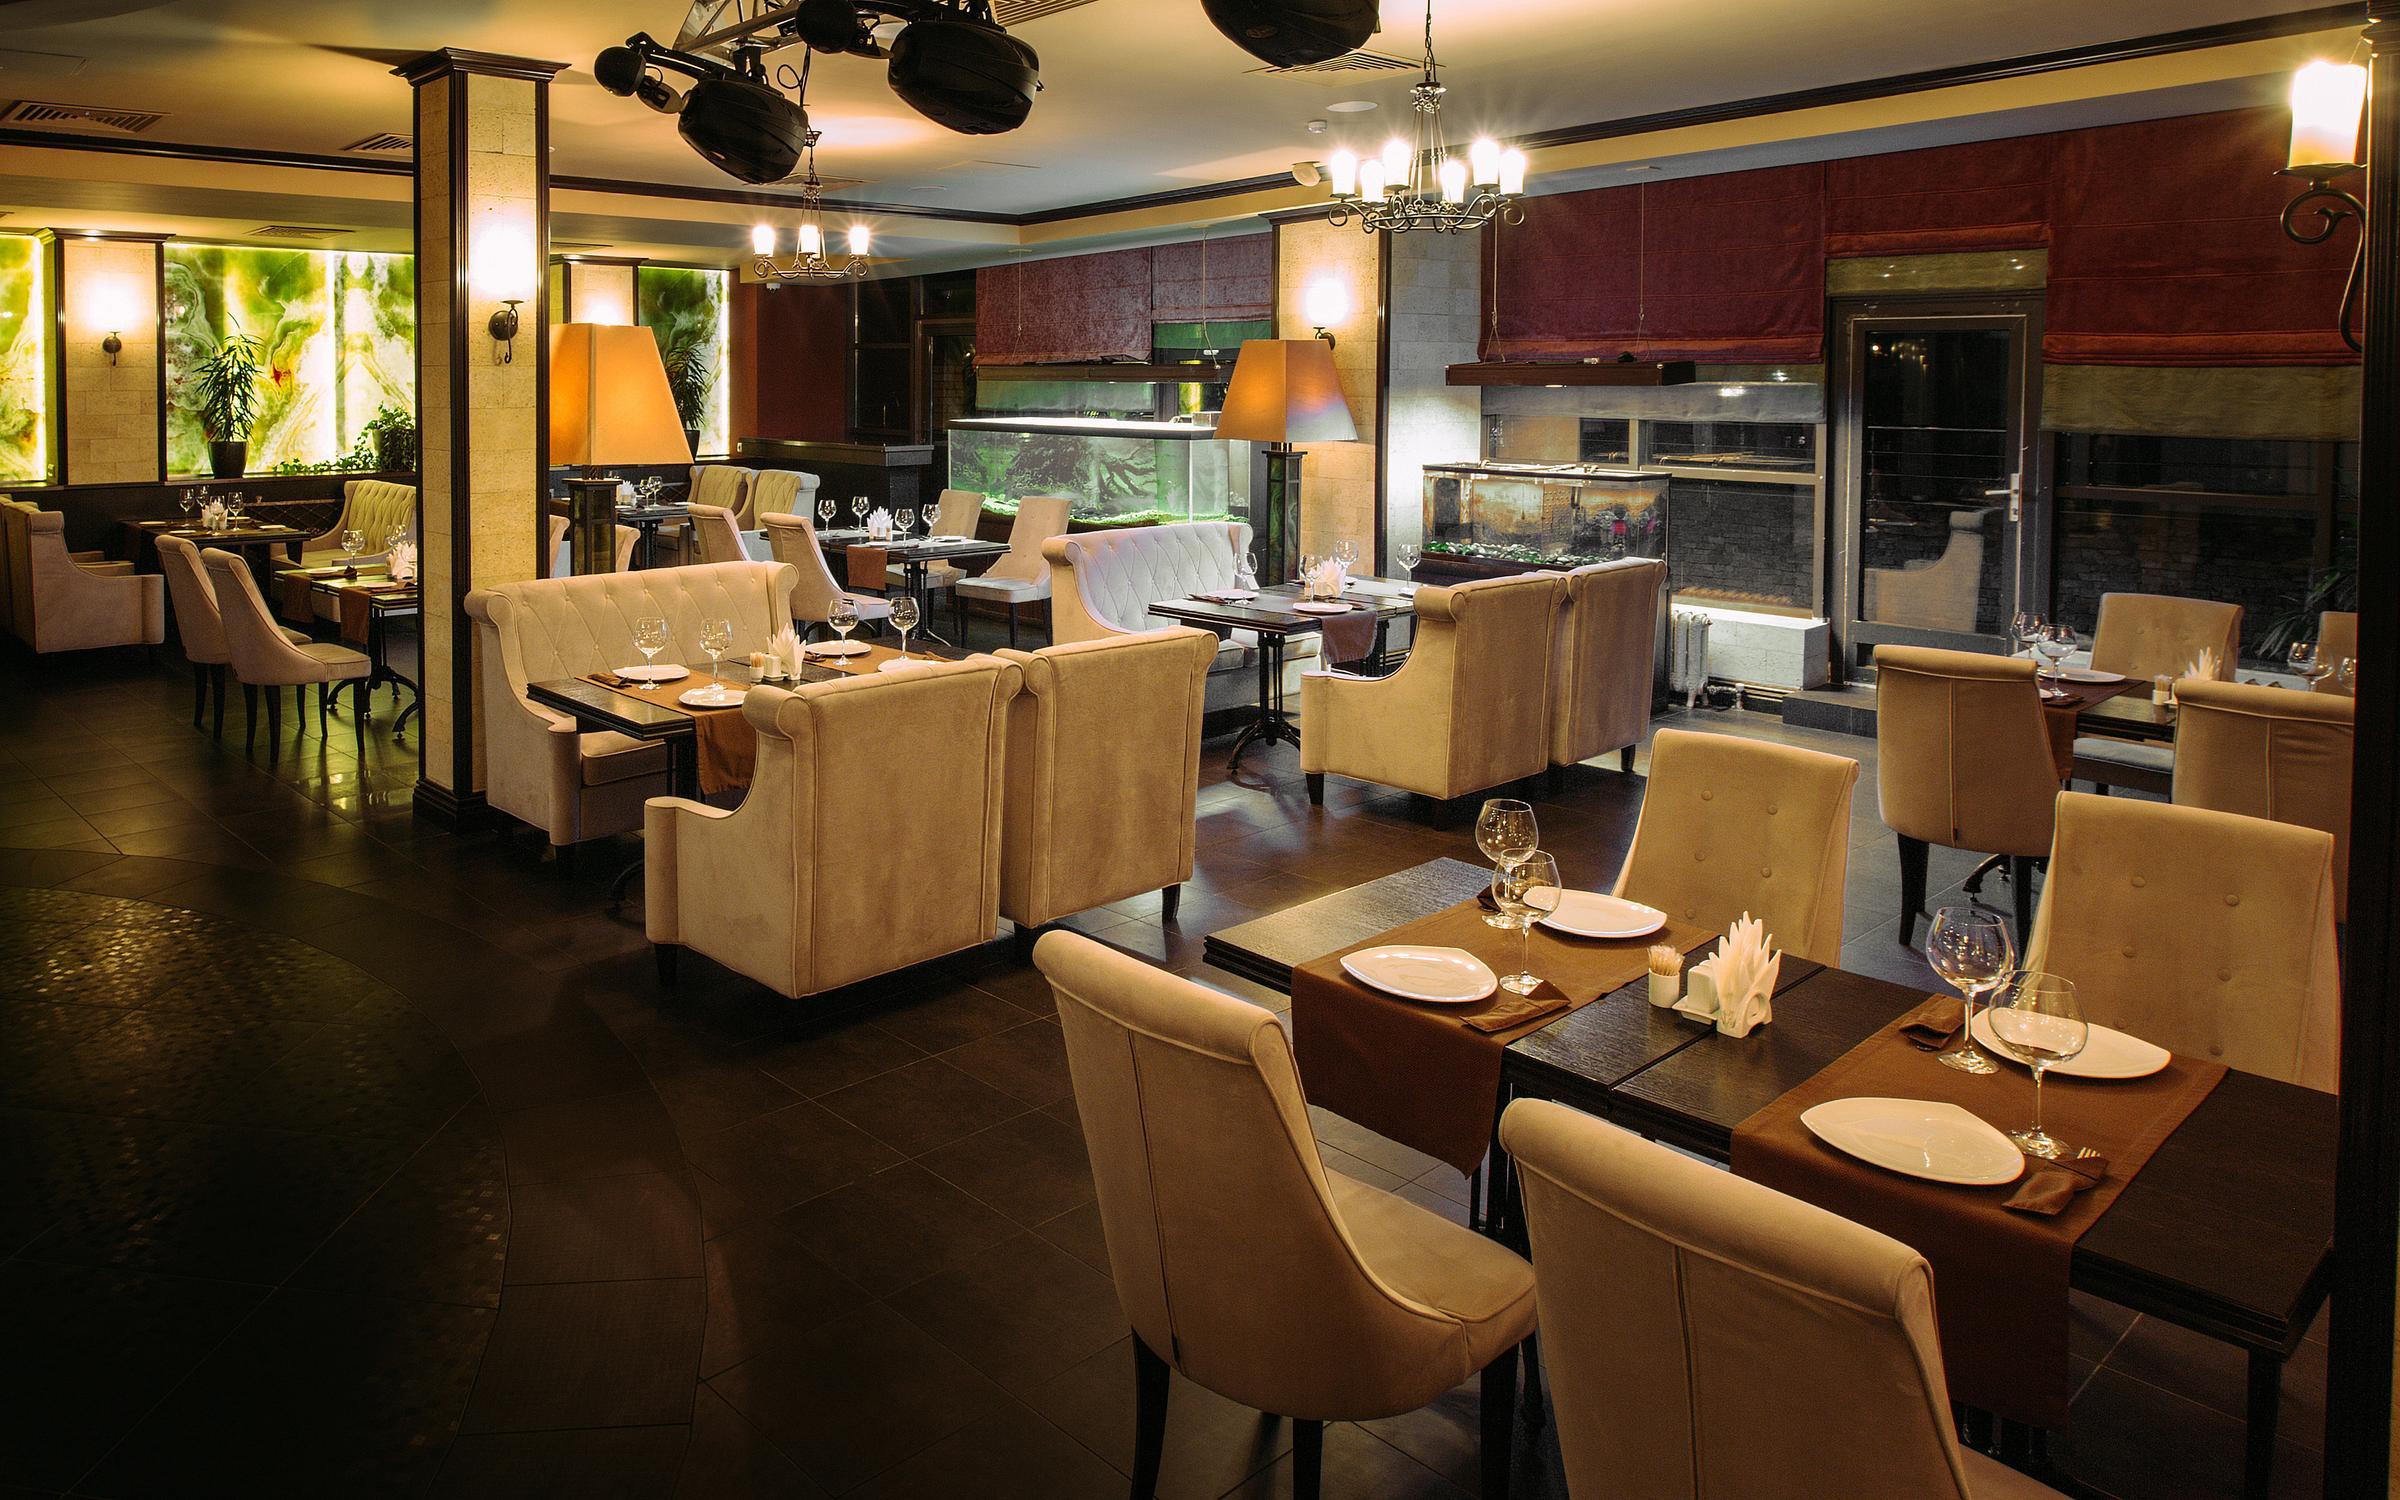 фотография Ресторана Арагон на улице Кудрявцева